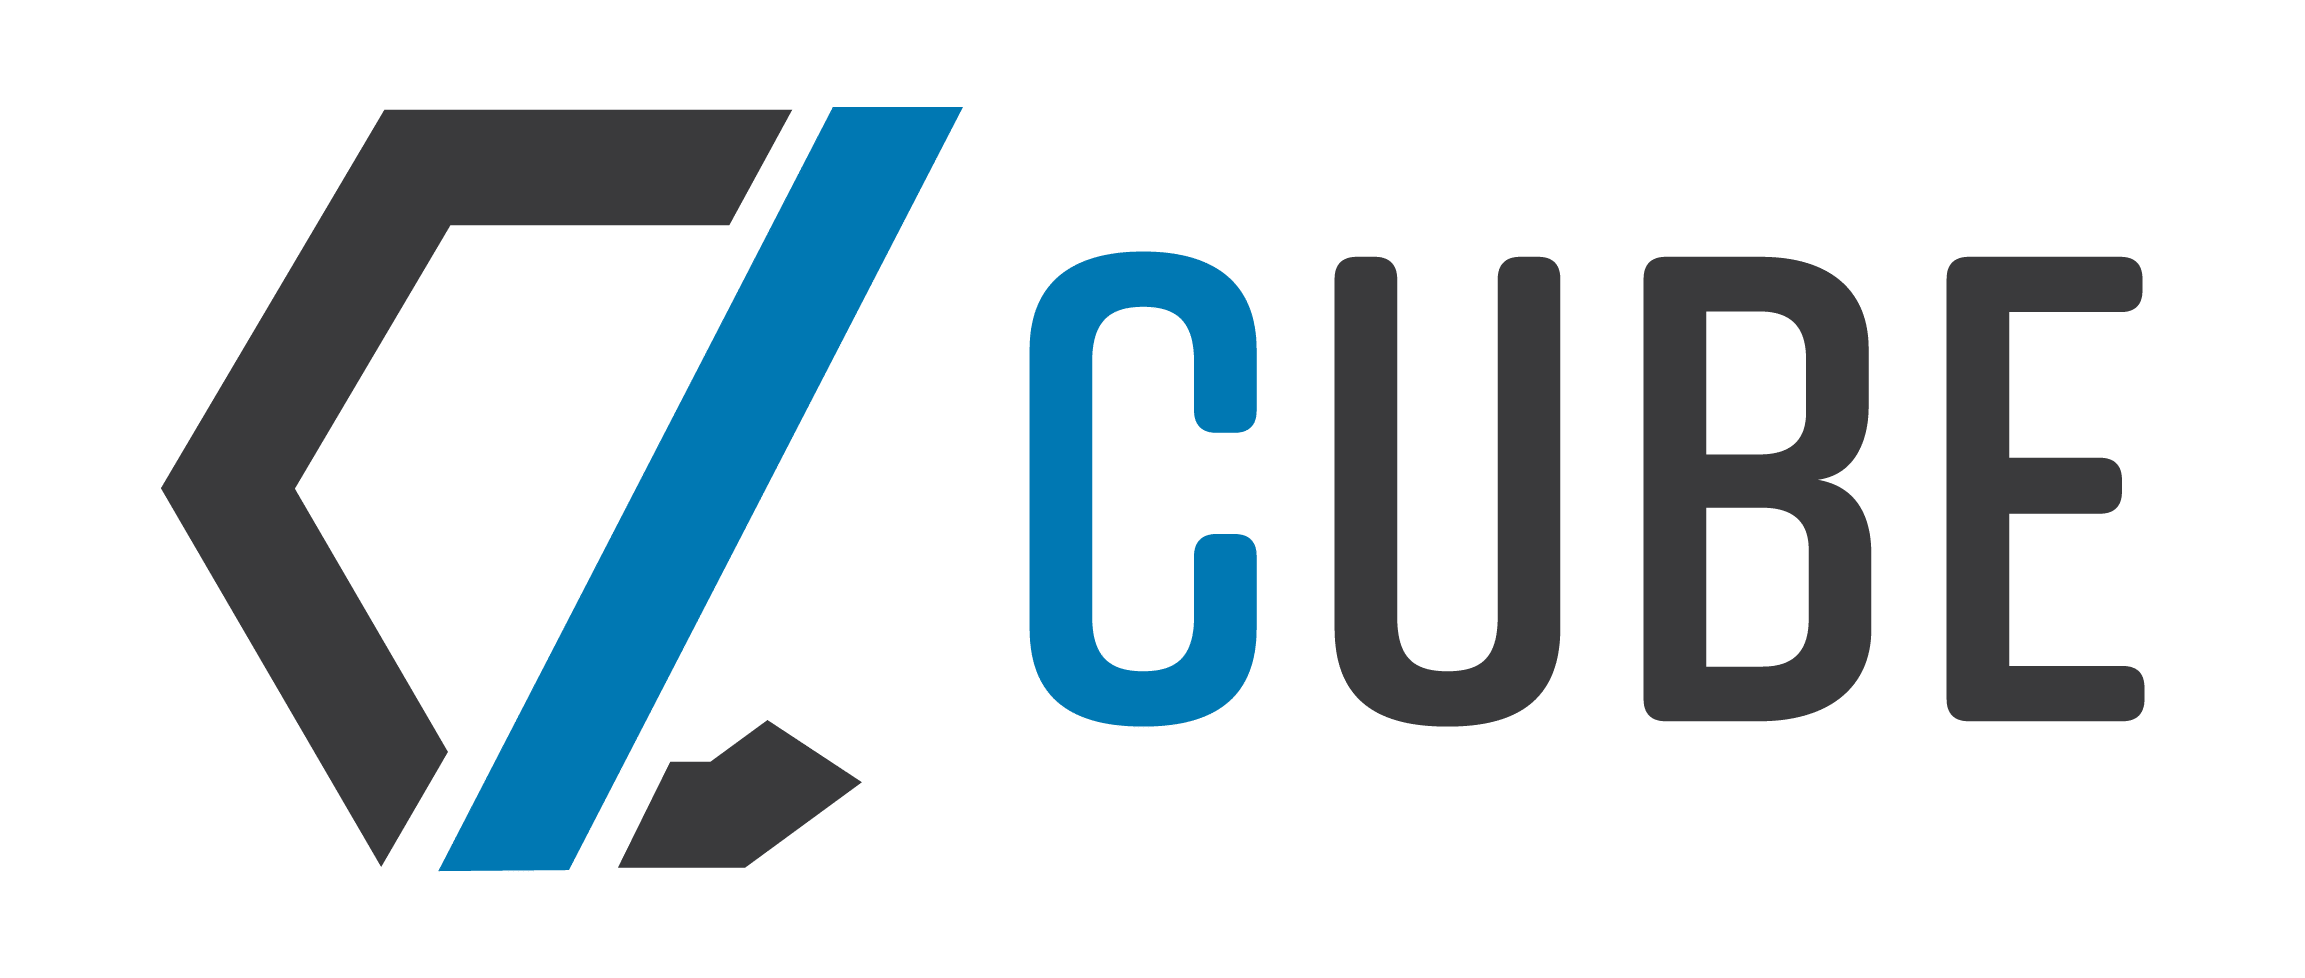 Cube Versatile Mobile Storage Solutions Logo